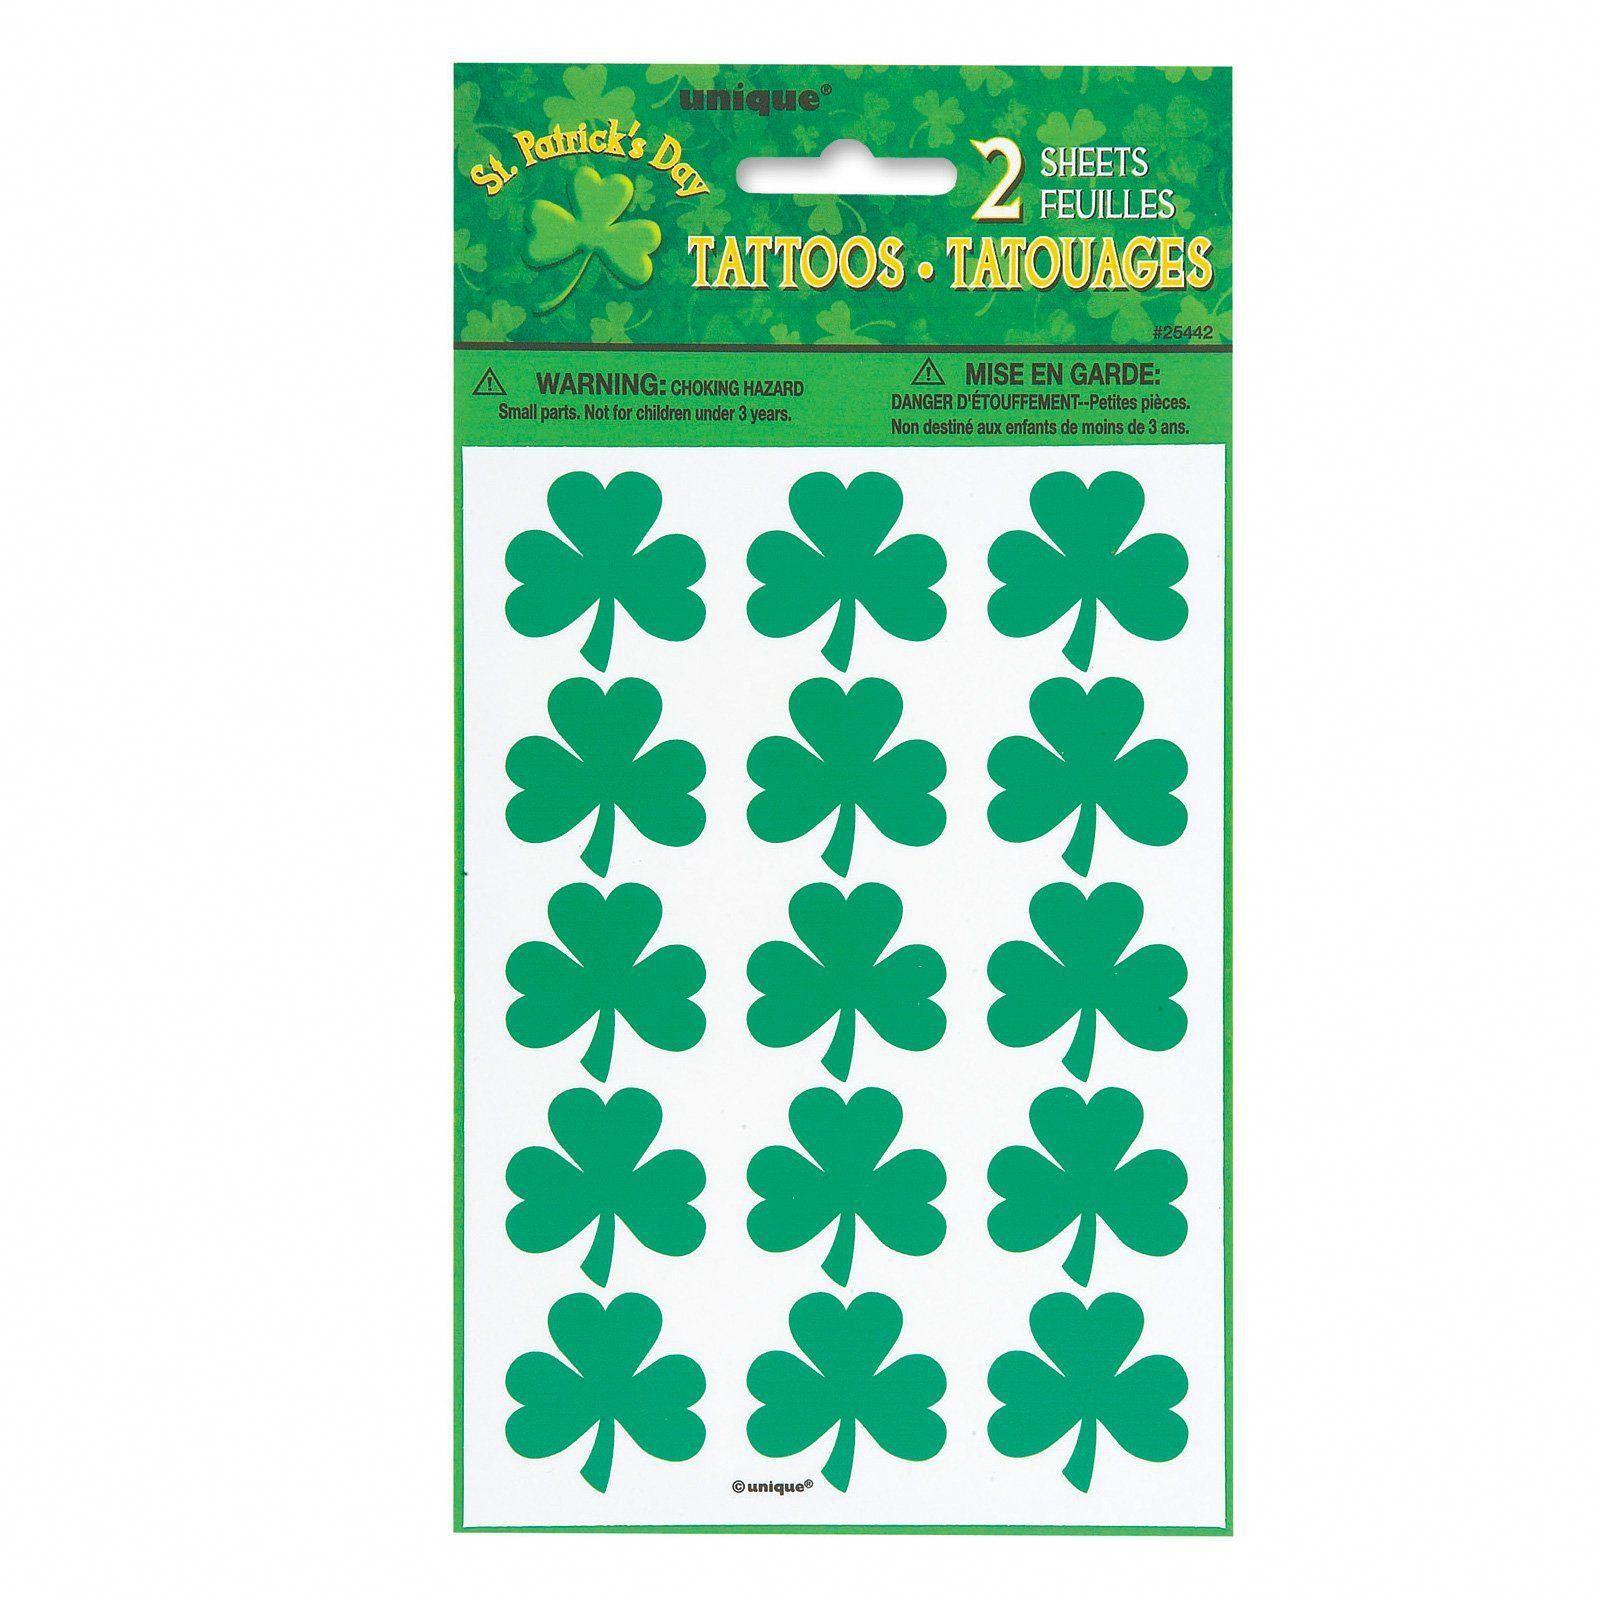 Shamrock tattoo sheets 2 count description show your